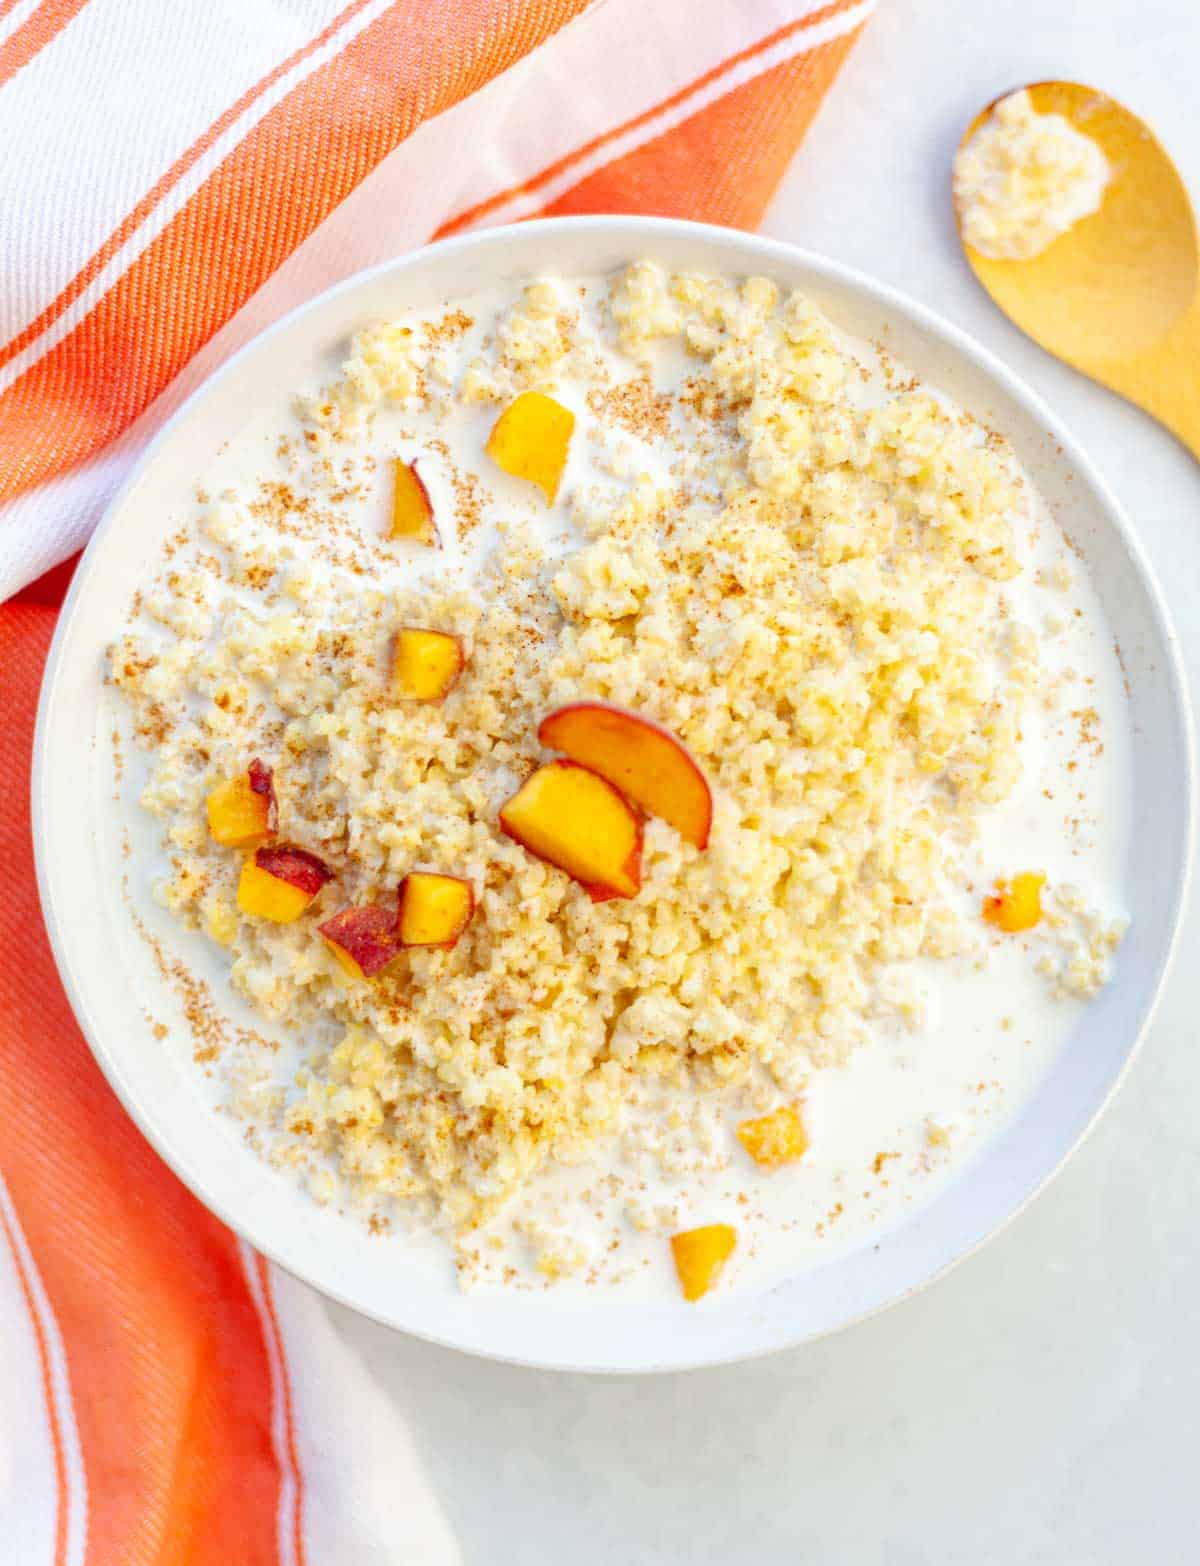 bowl of millet porridge with milk, peaches and cinnamon